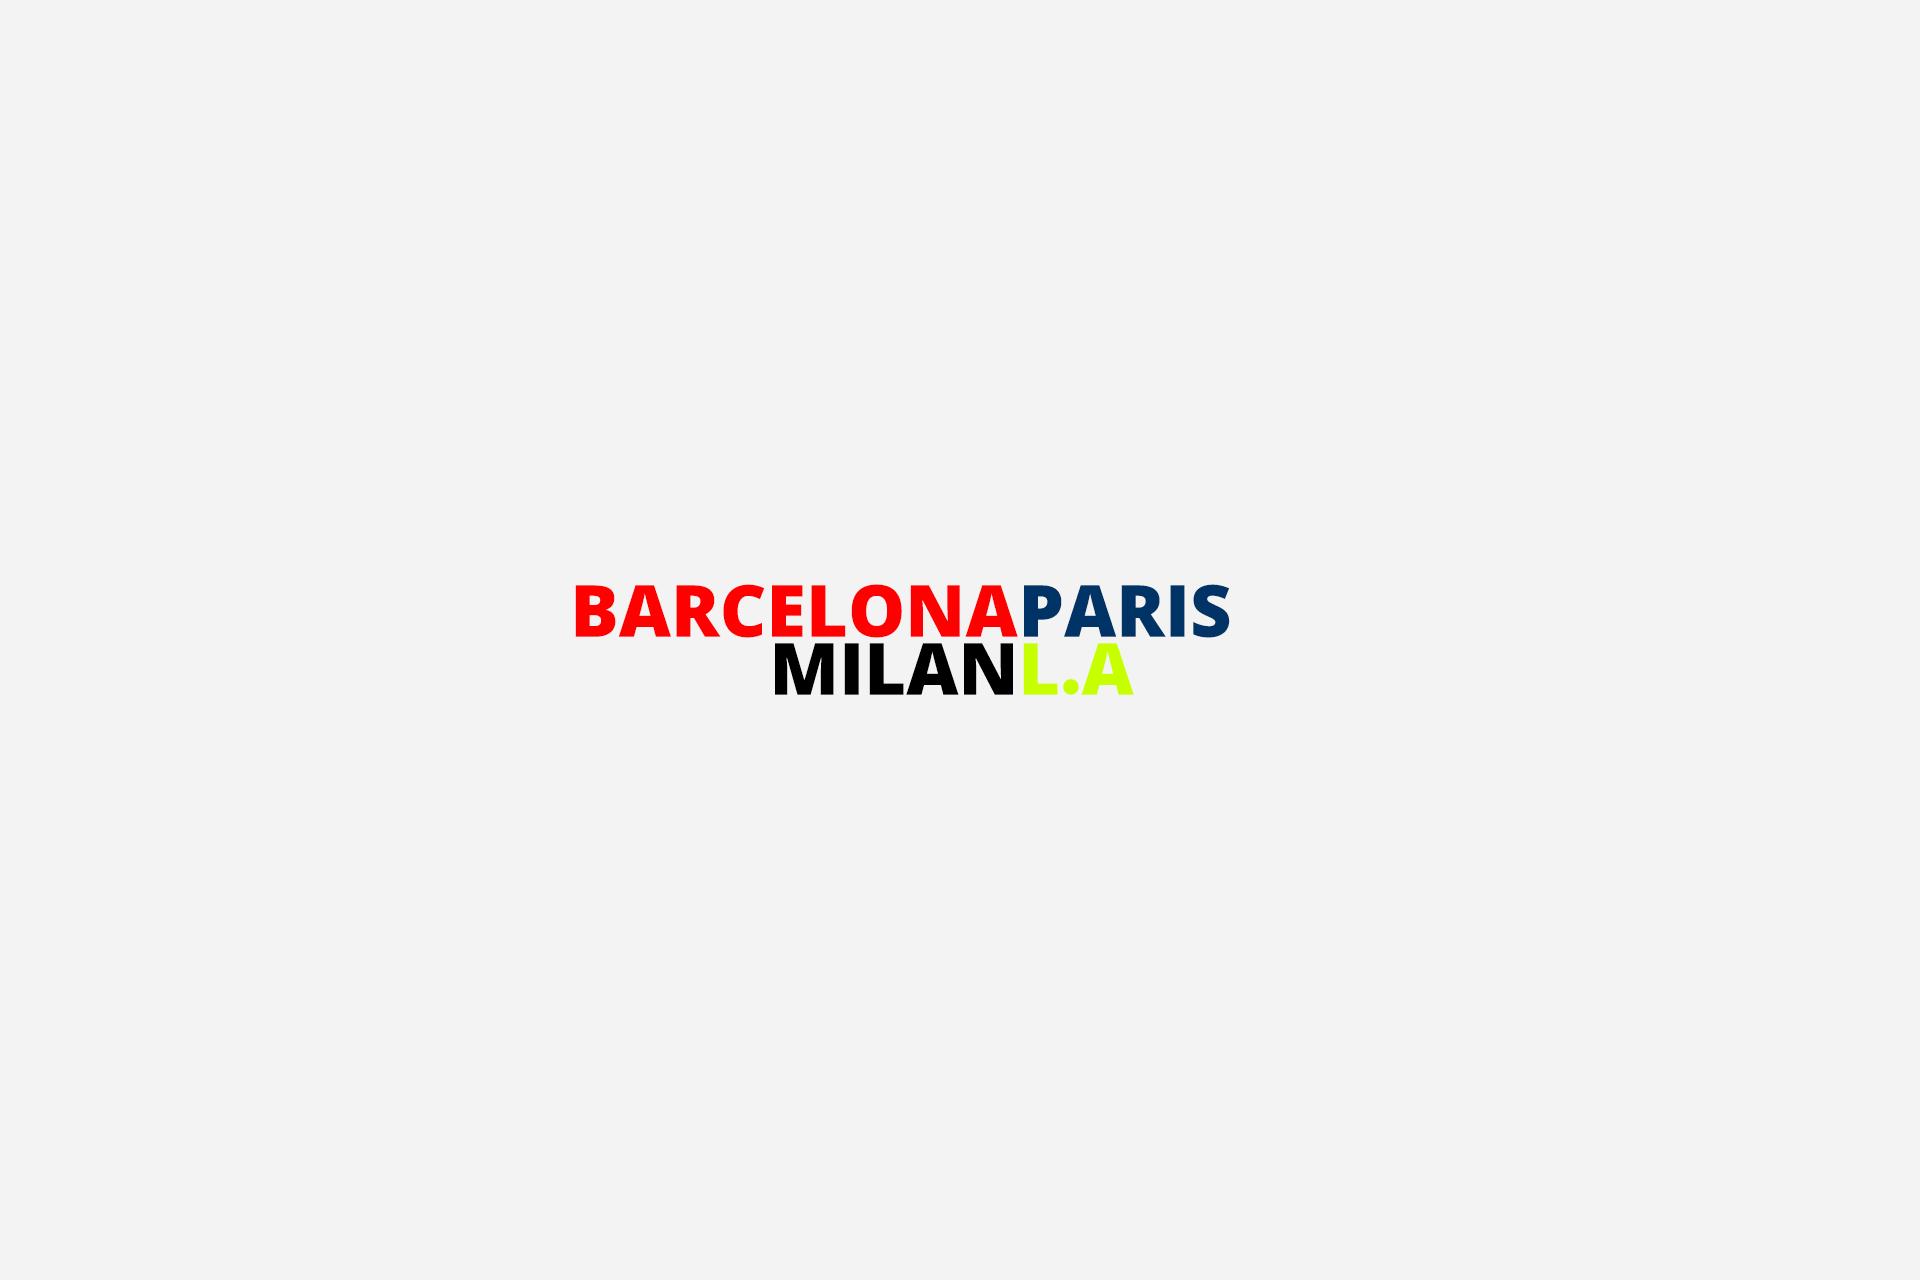 زلاتان ابراهیموویچ, بارسلونا, میلان, پاریس, لسآنجلس